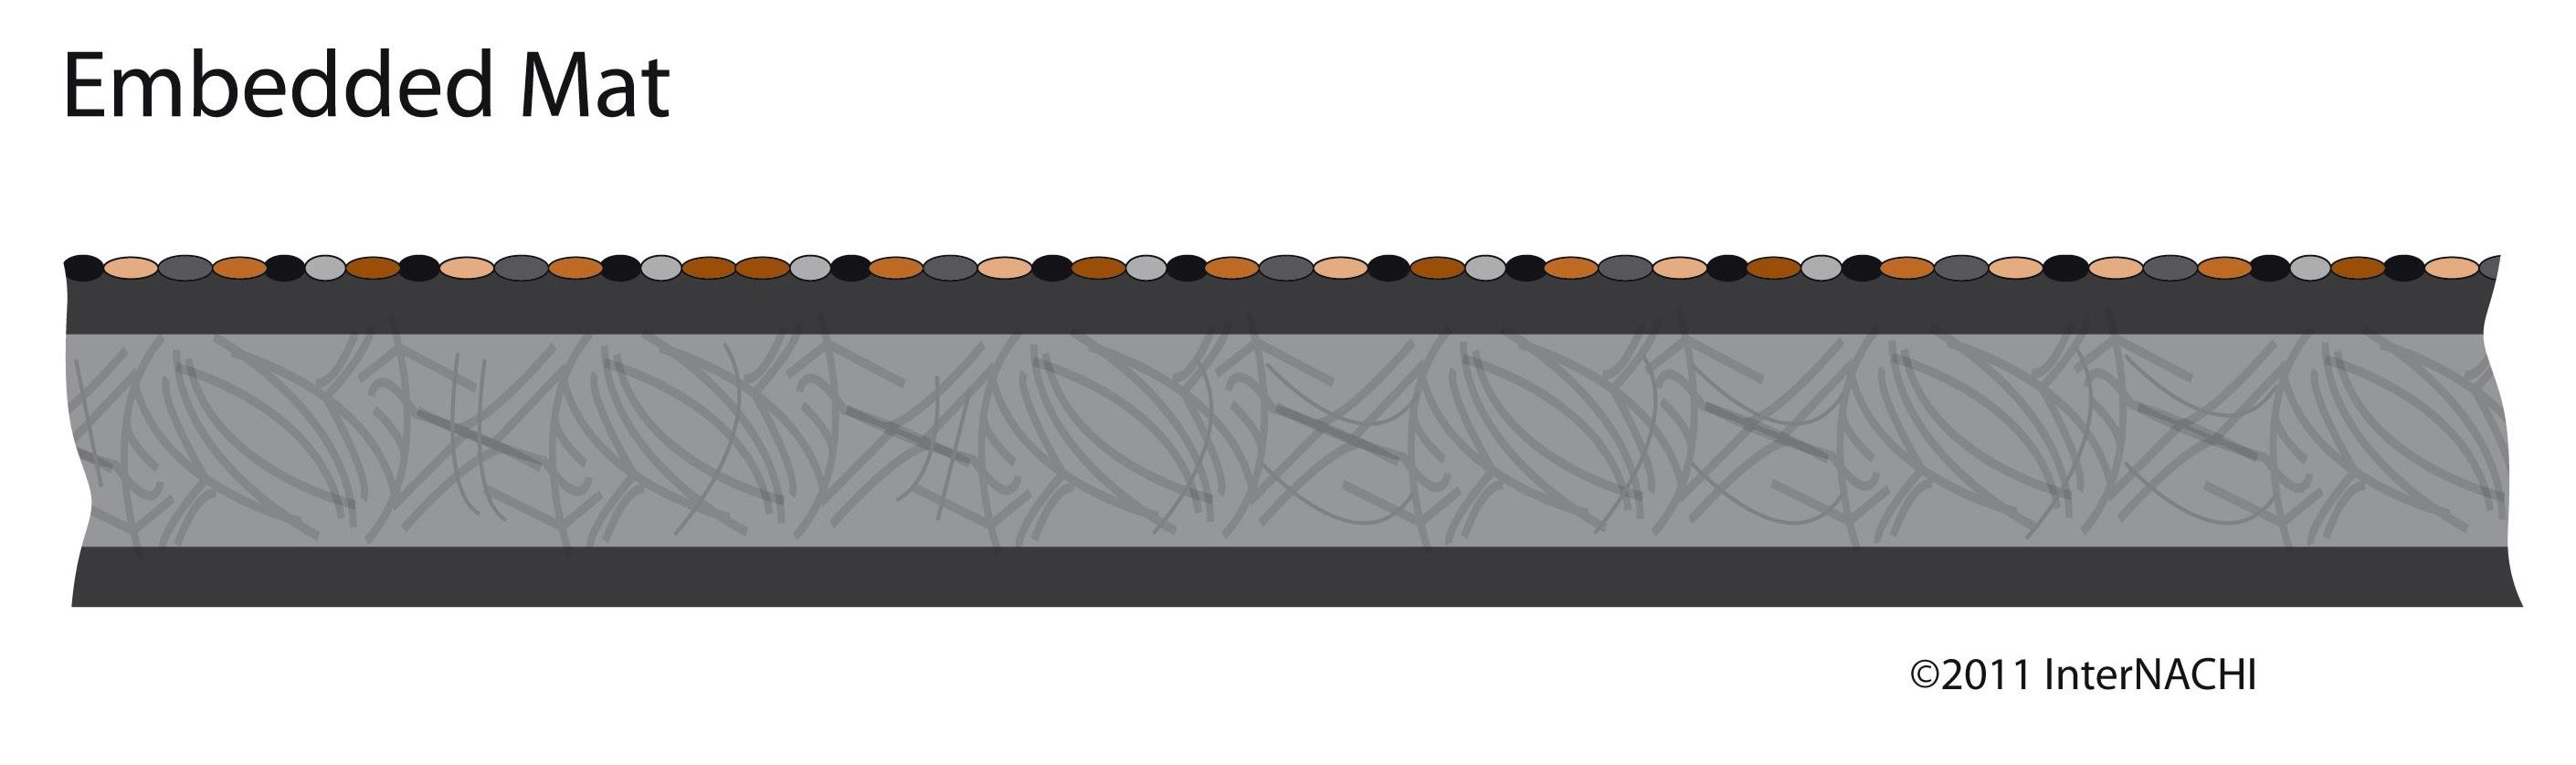 Embedded mat.